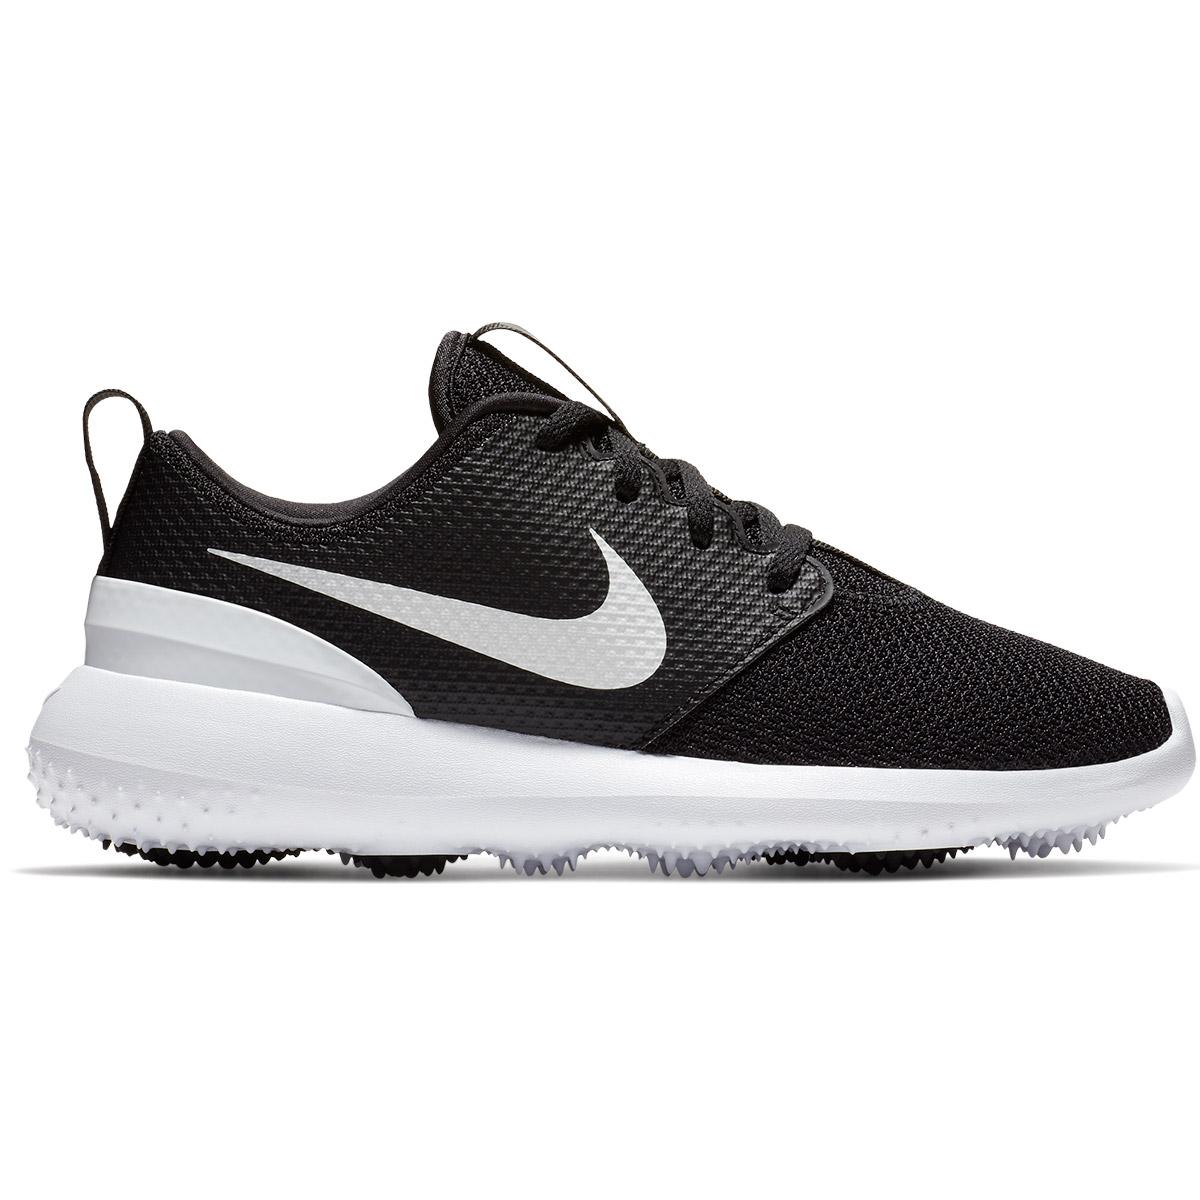 a7ec83e51fe3 Nike Golf Rosche G Juniors Shoes from american golf